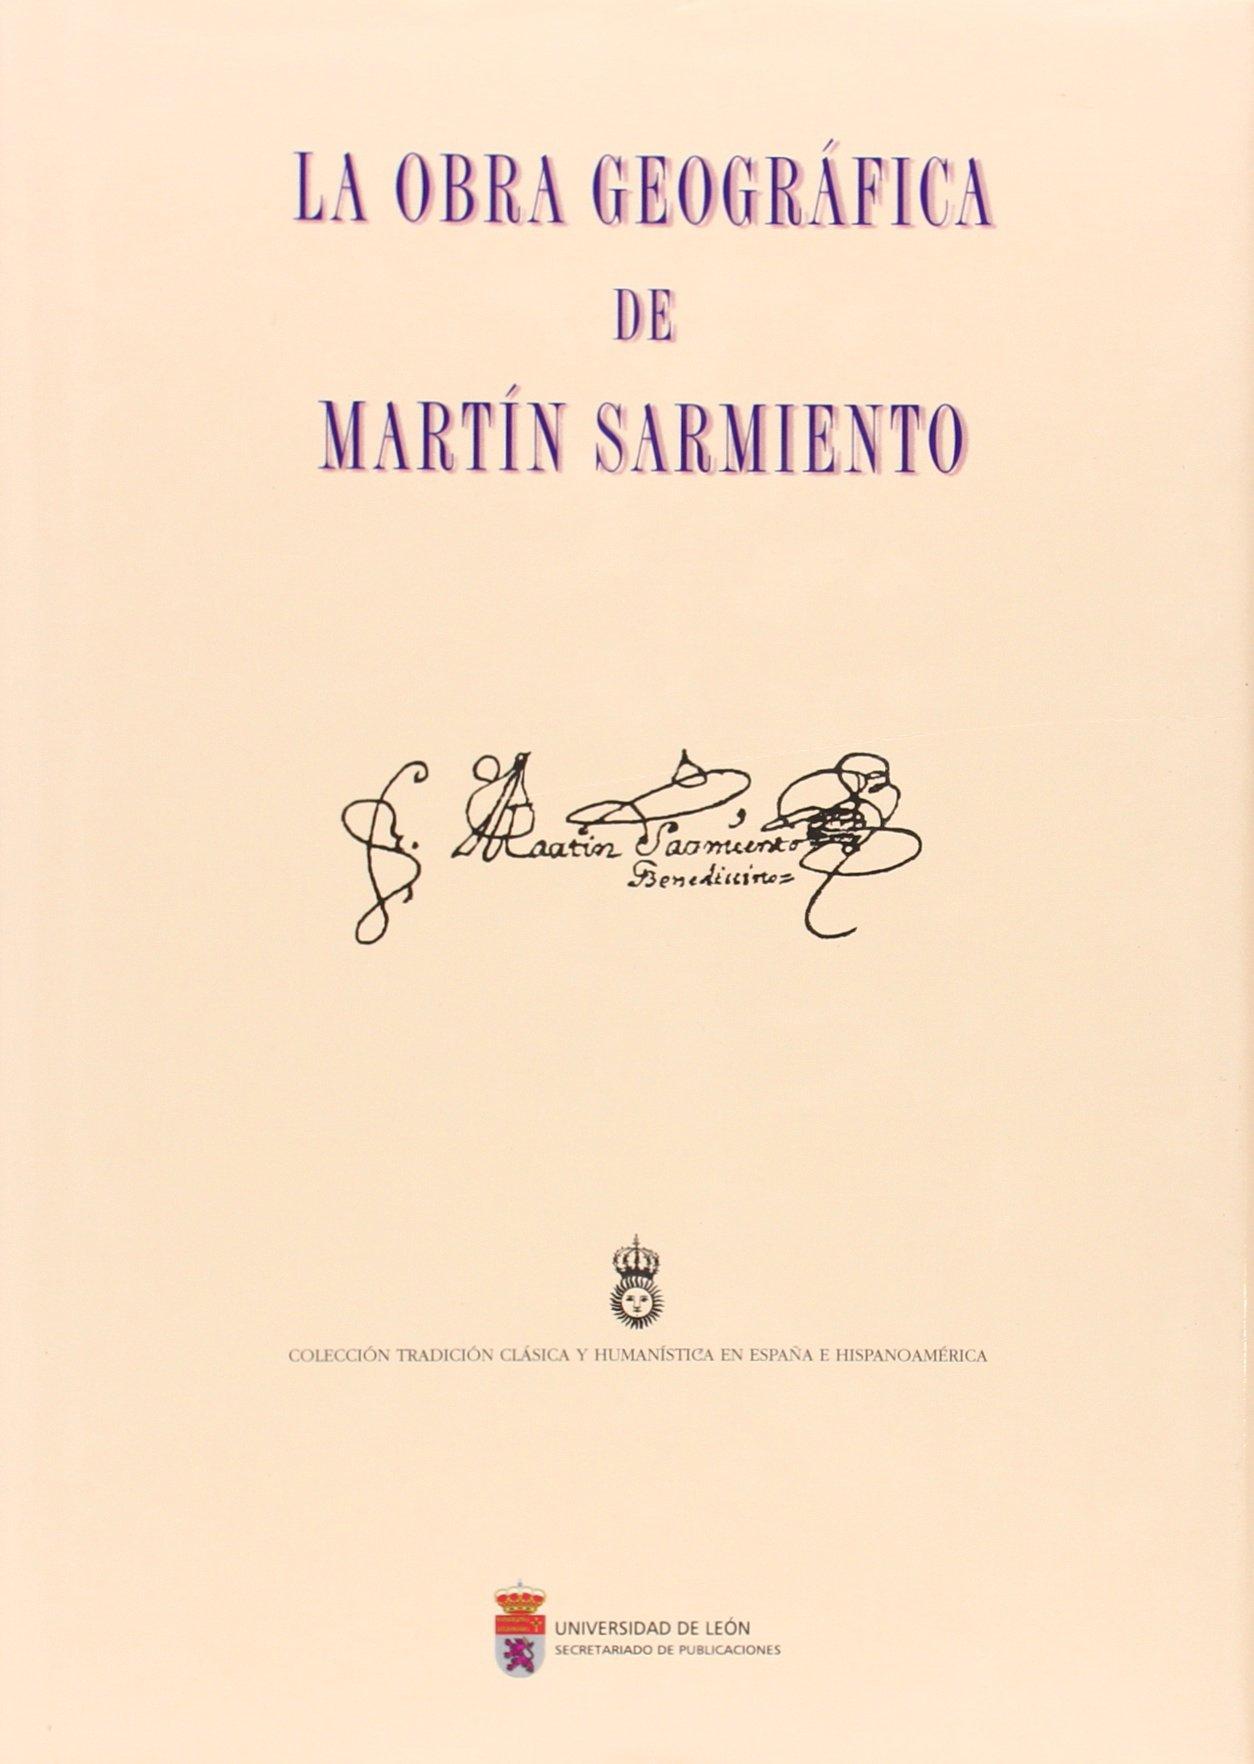 Download la_obra_geografica_de_martin_sarmiento PDF